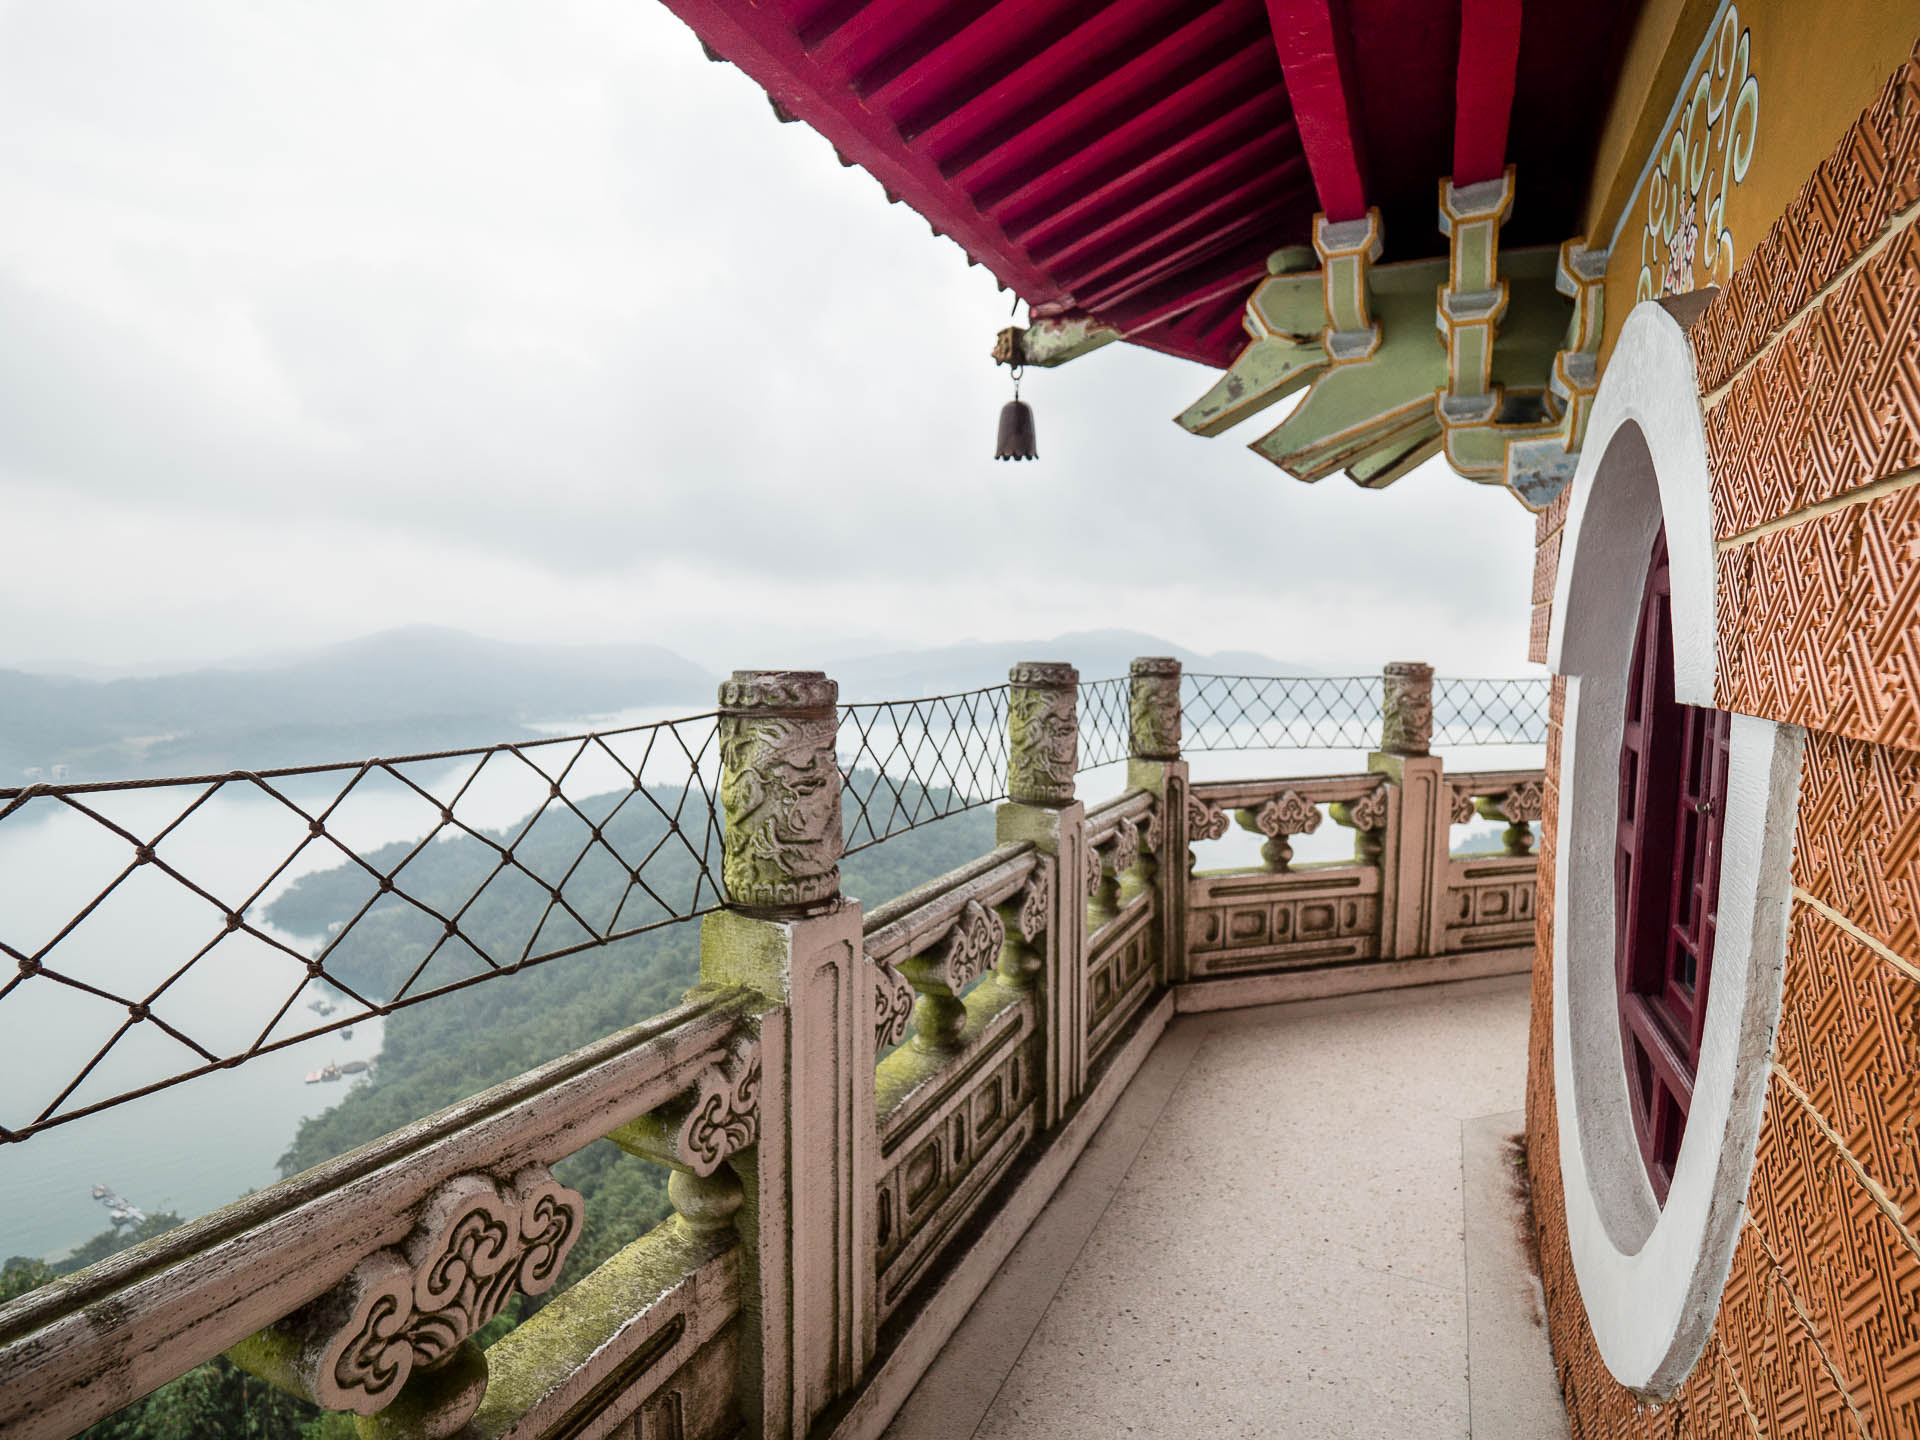 Sun moon lake cien pagoda fenêtre - Les globe blogueurs - blog voyage nature